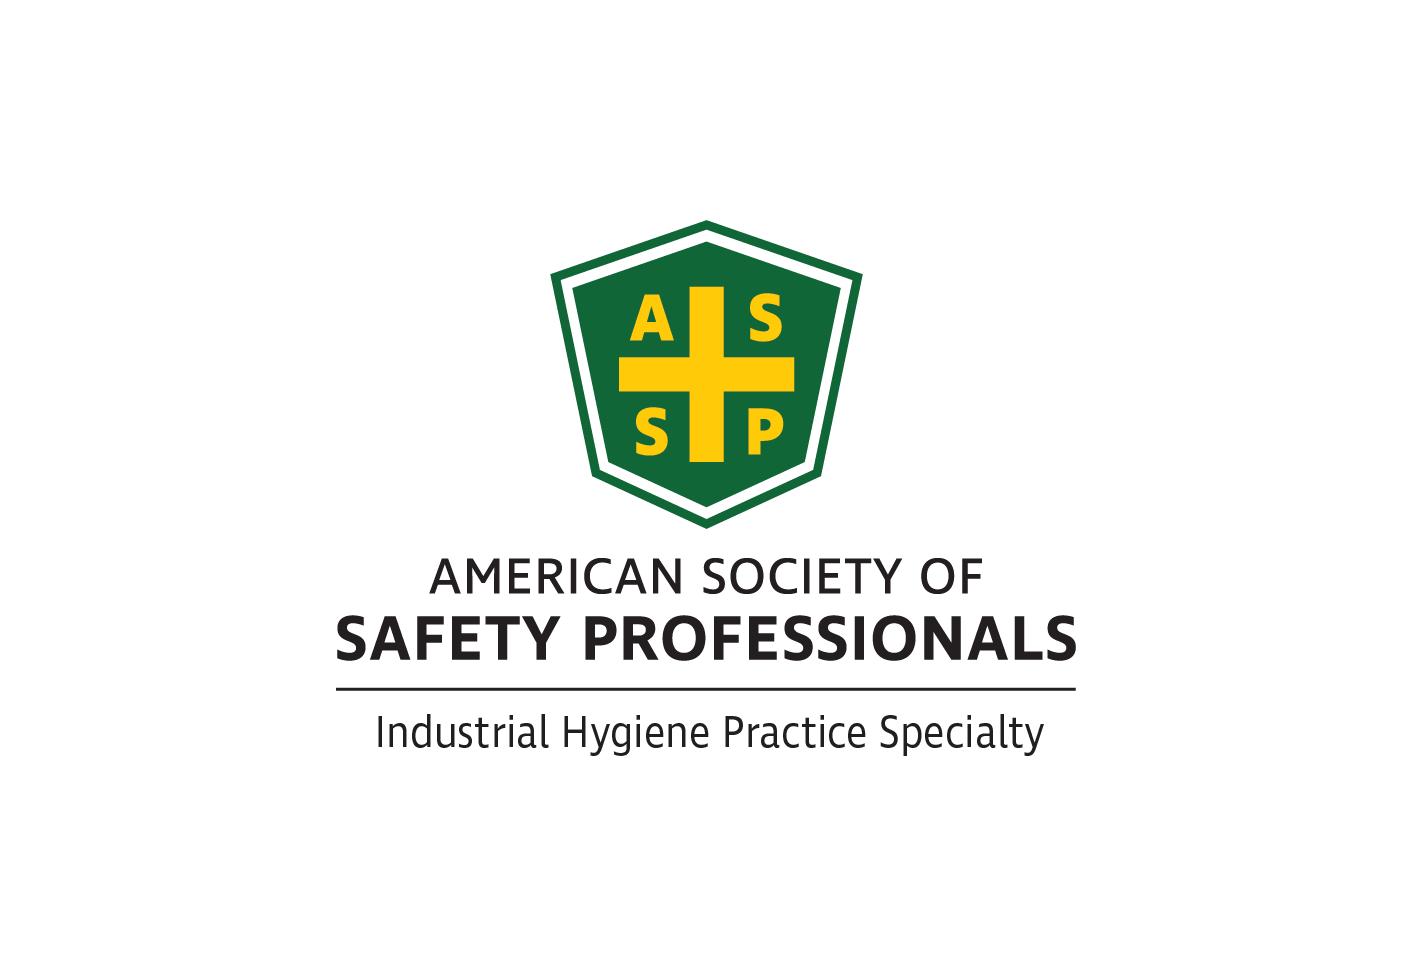 Industrial Hygiene Practice Specialty